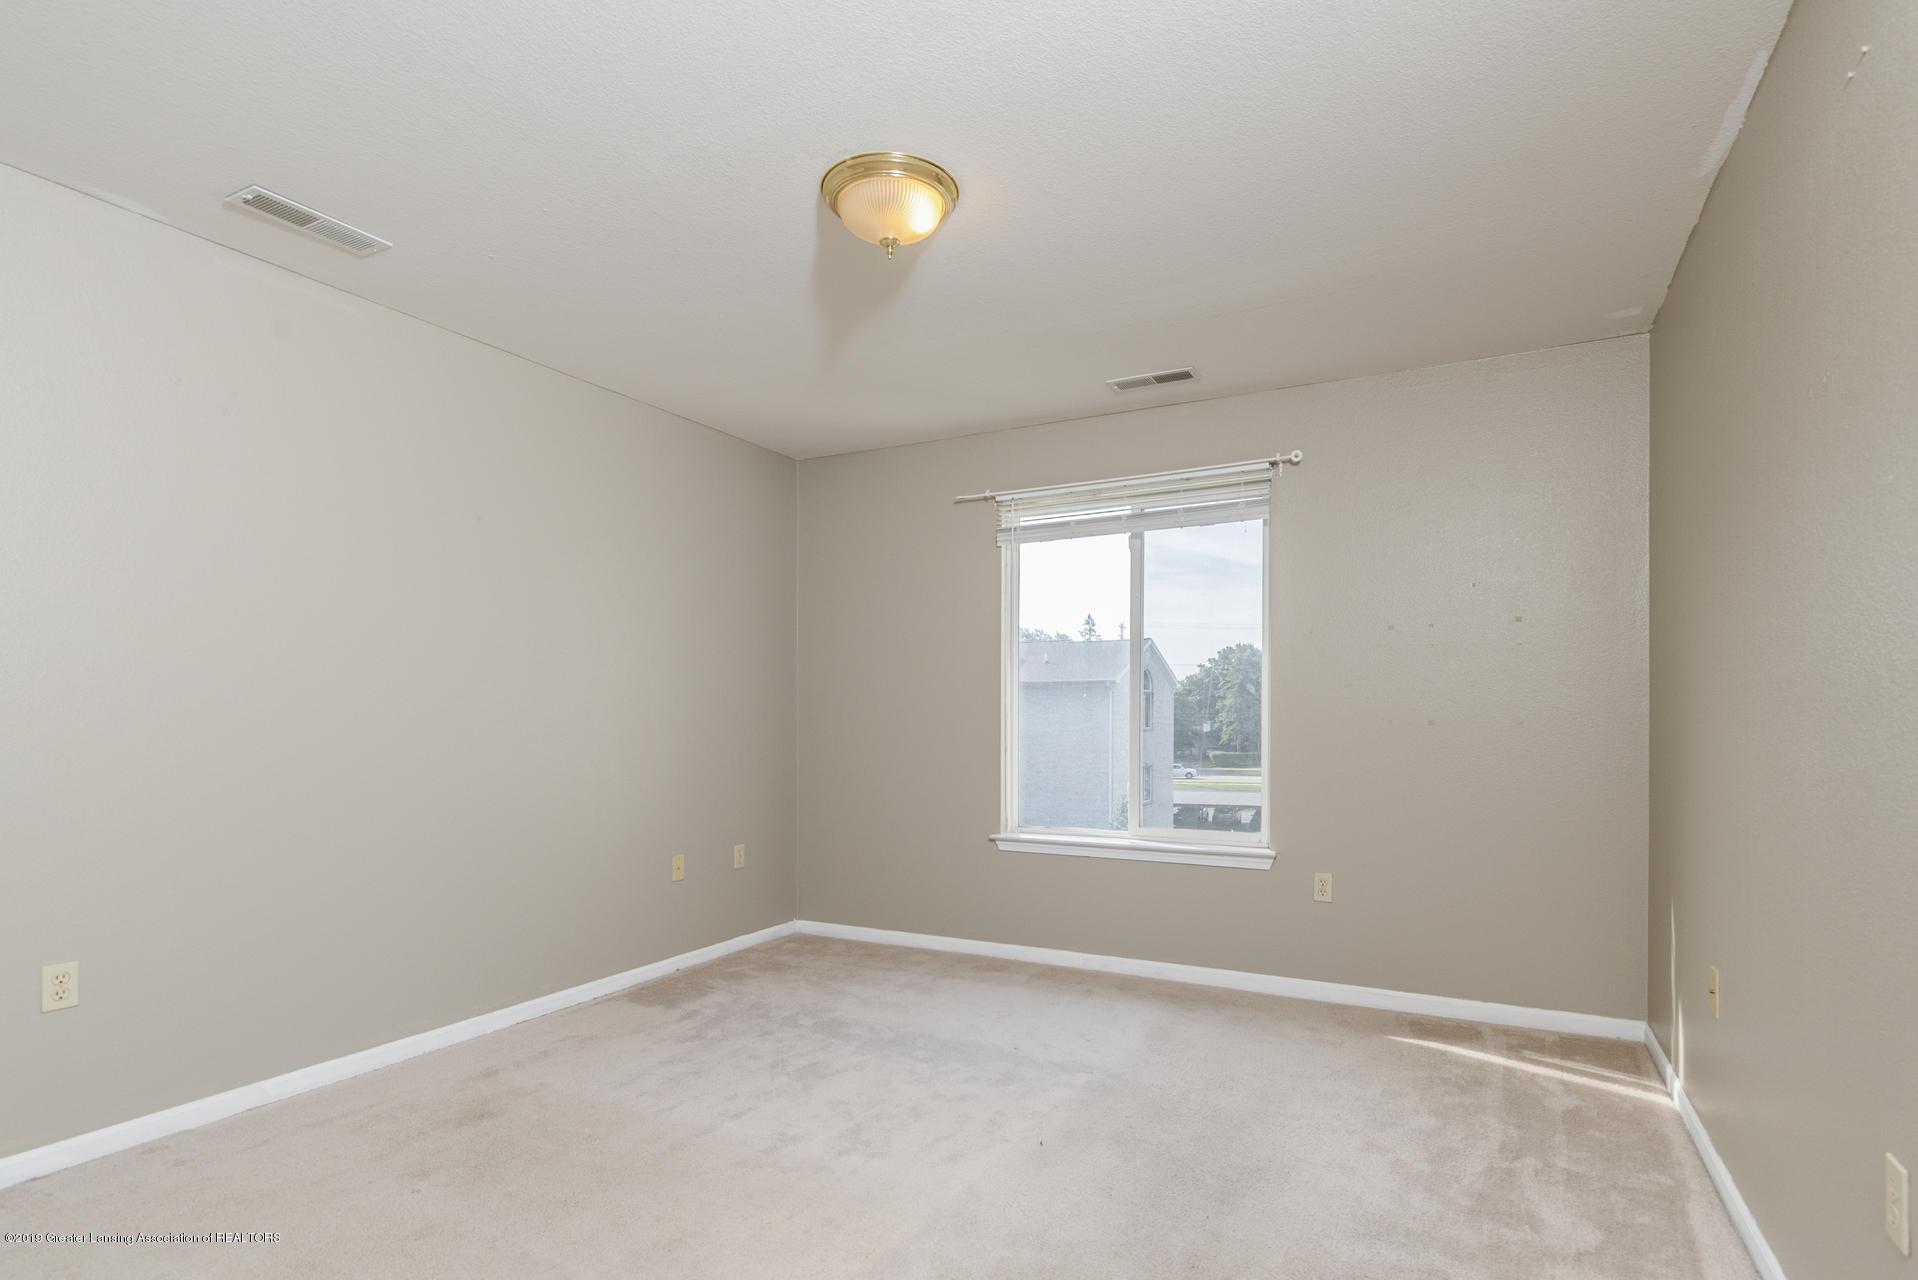 338 W Saginaw St UNIT 44 - 015-photo-bedroom-7483695 - 16